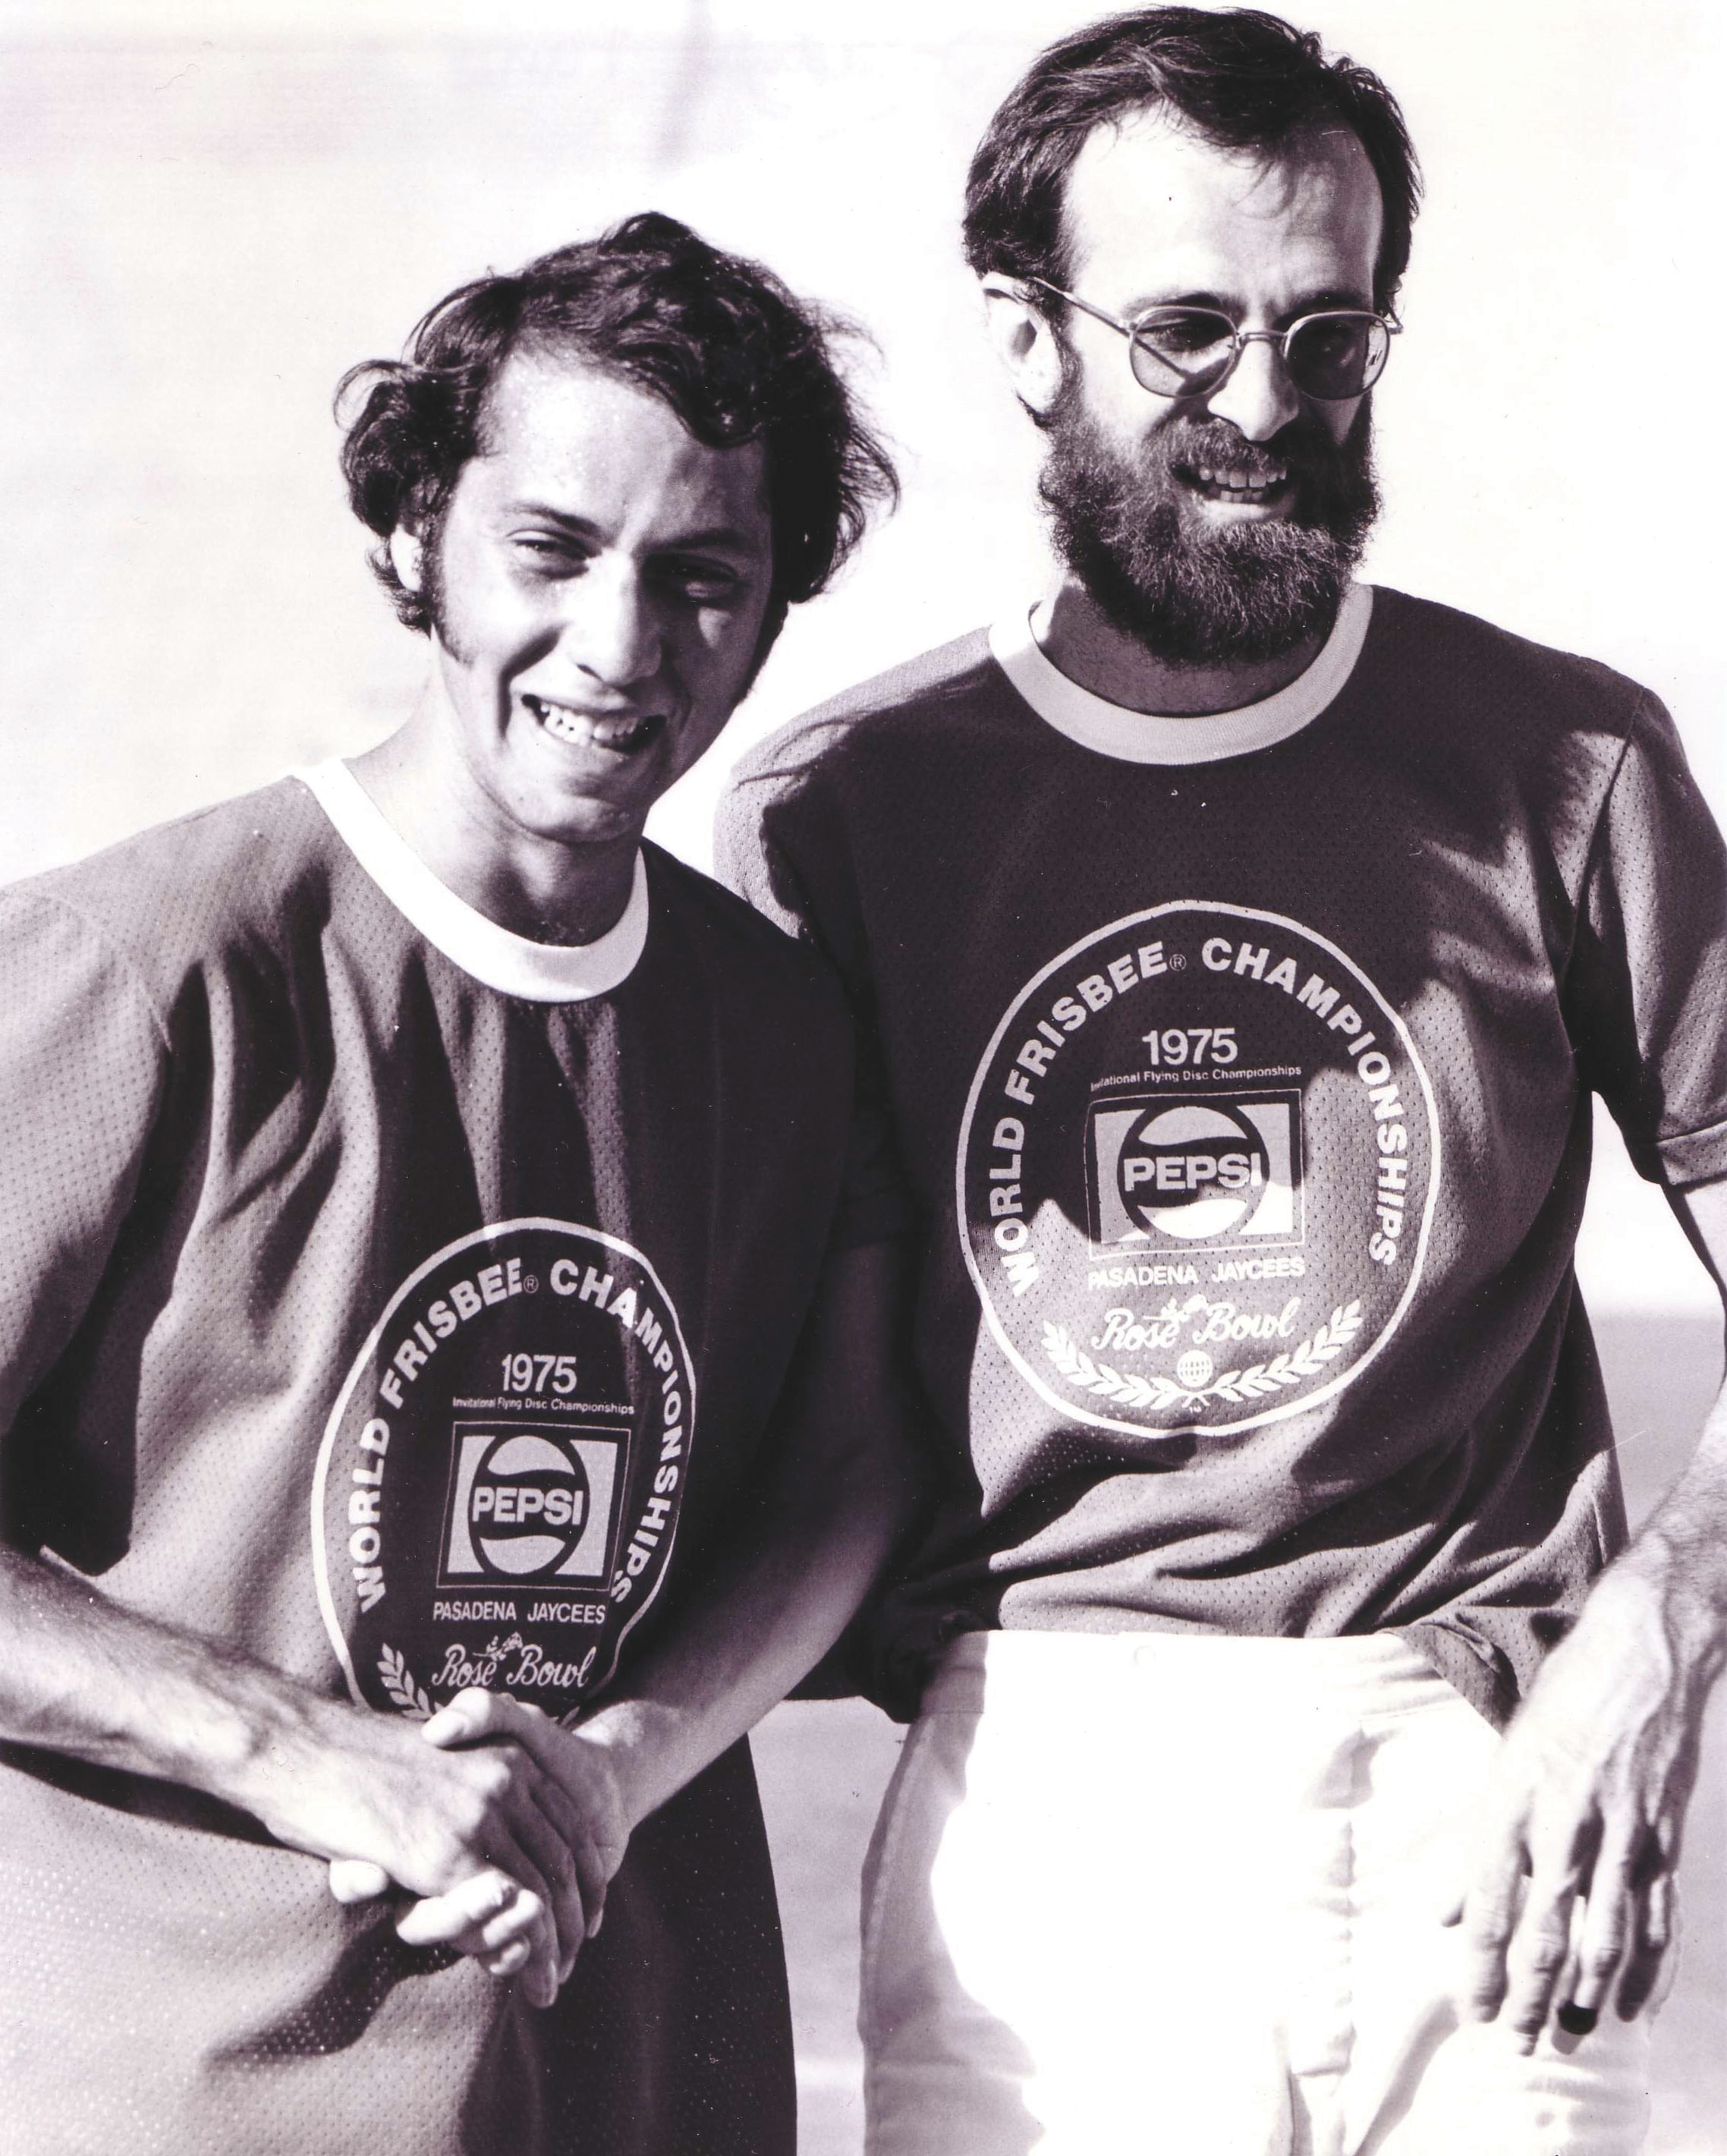 '75 Irv Kalb & Dan Roddick